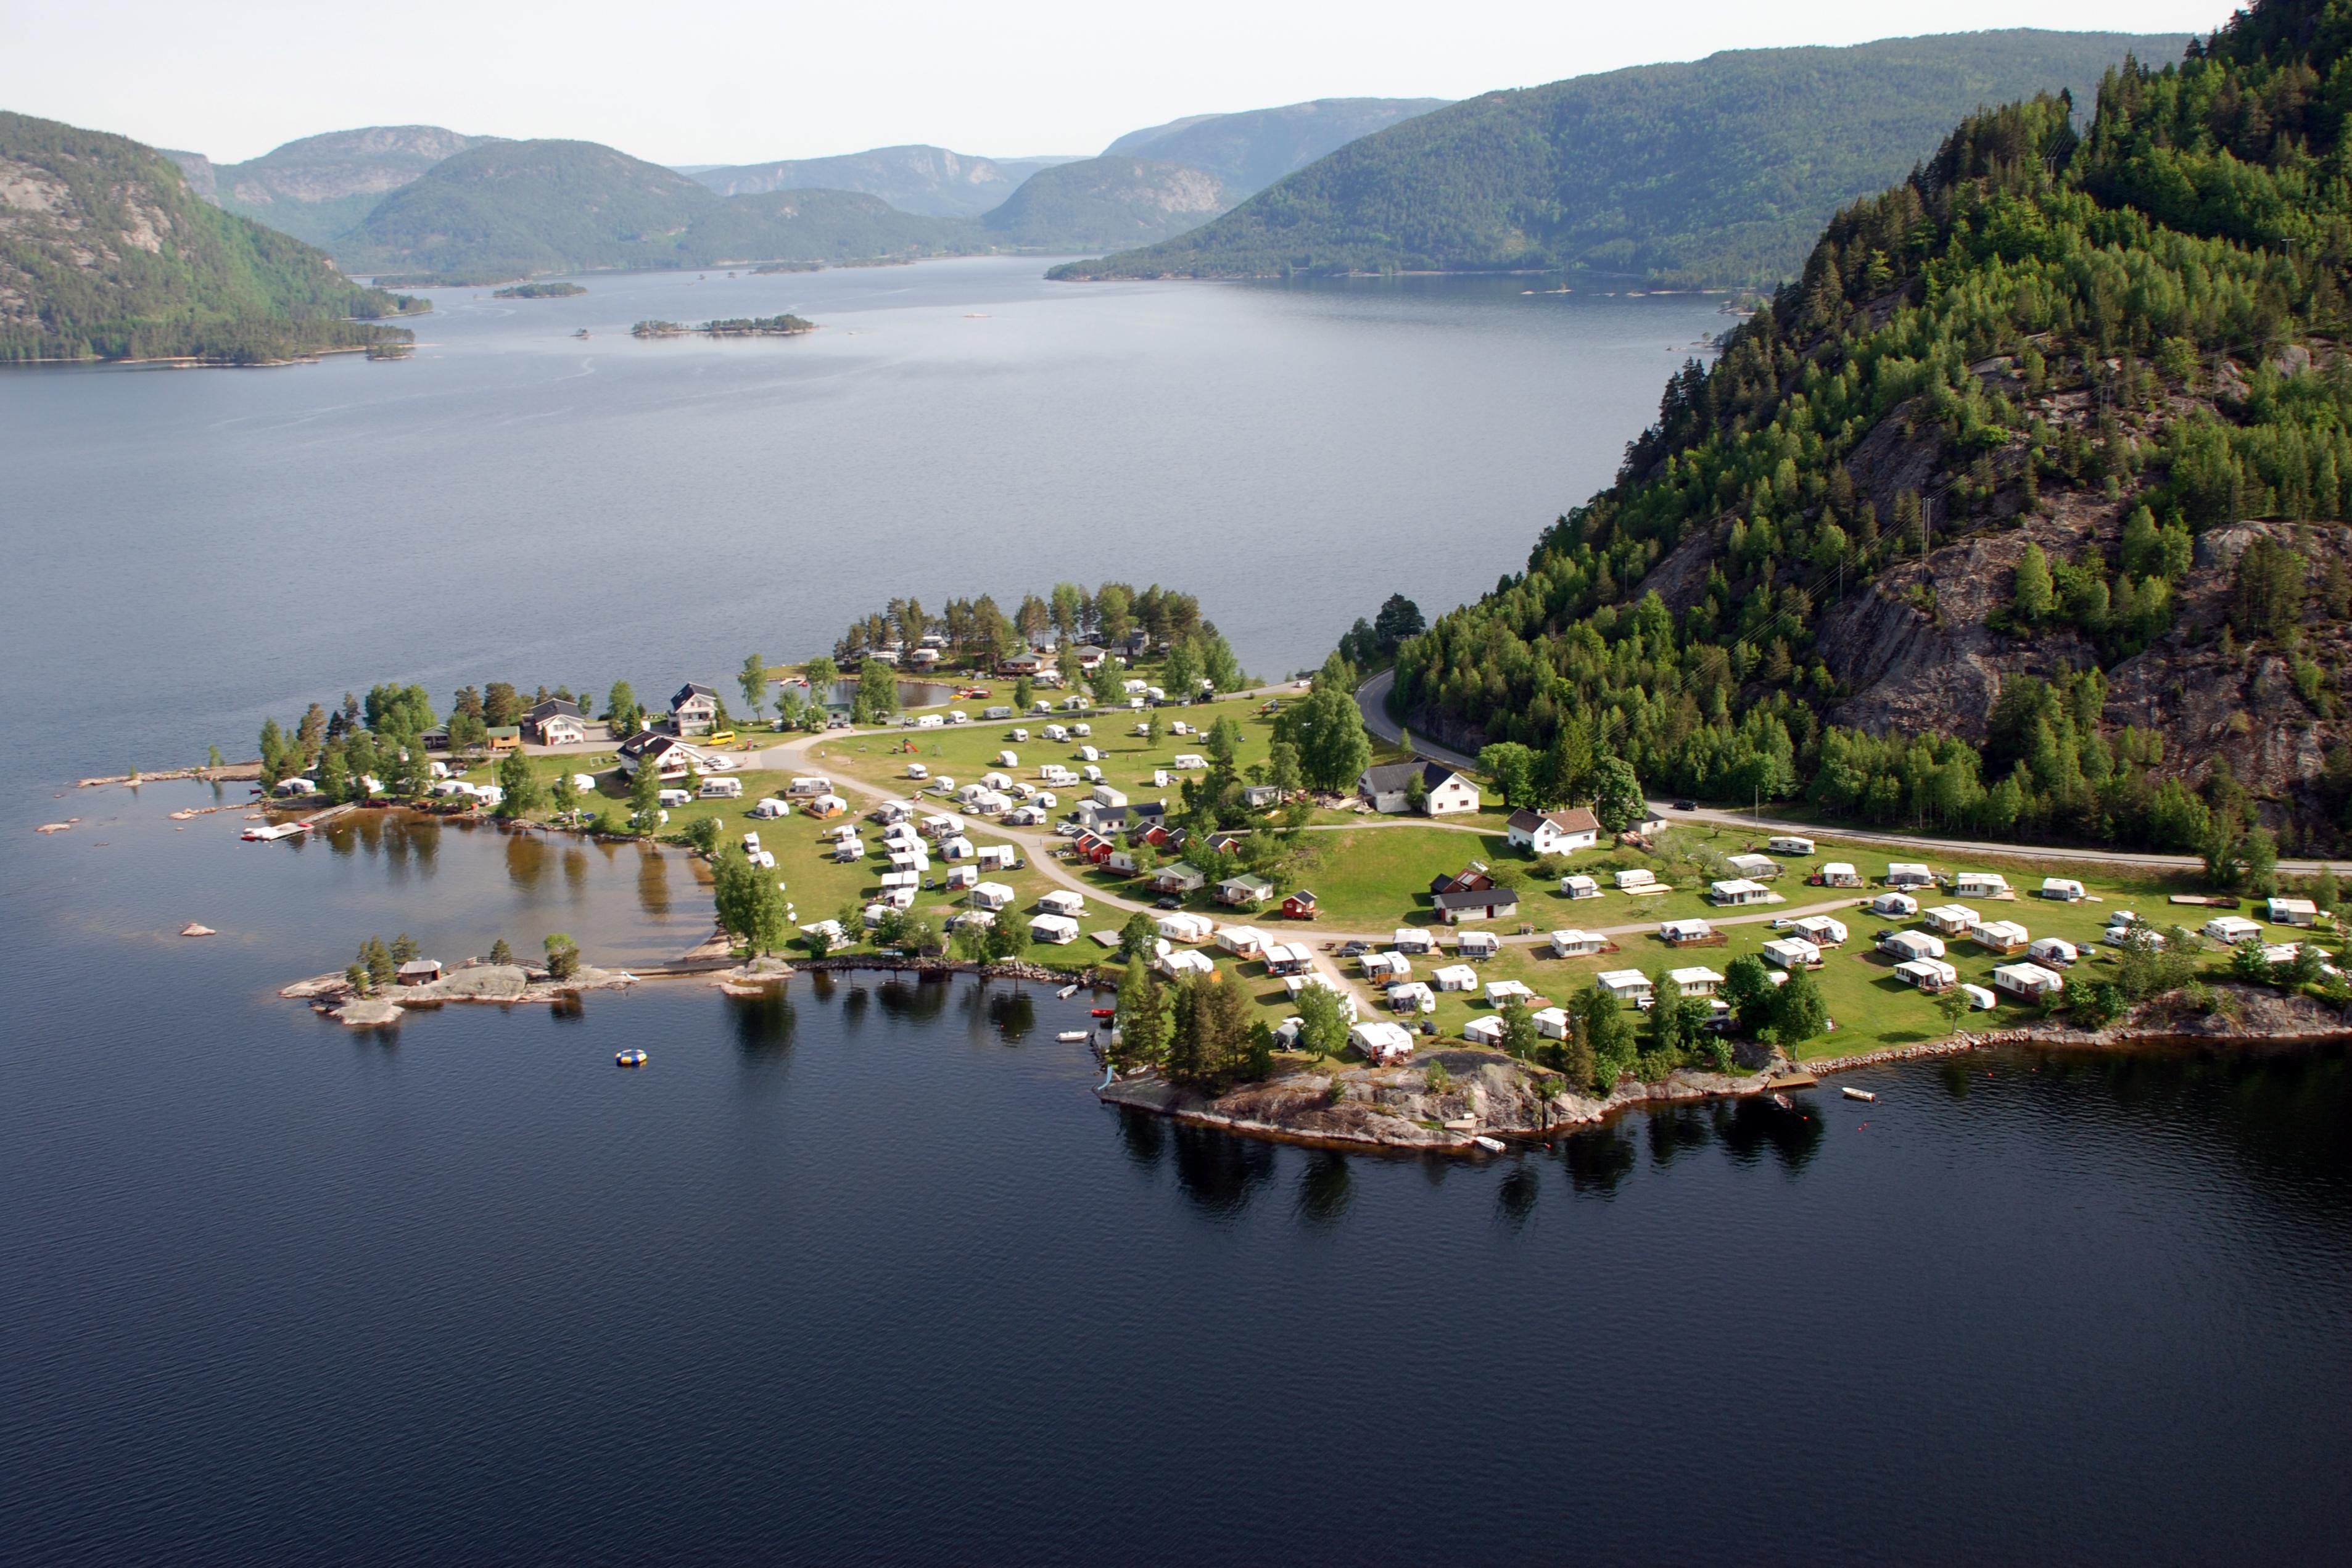 Campingplatze In Sudnorwegen Das Offizielle Reiseportal Fur Norwegen